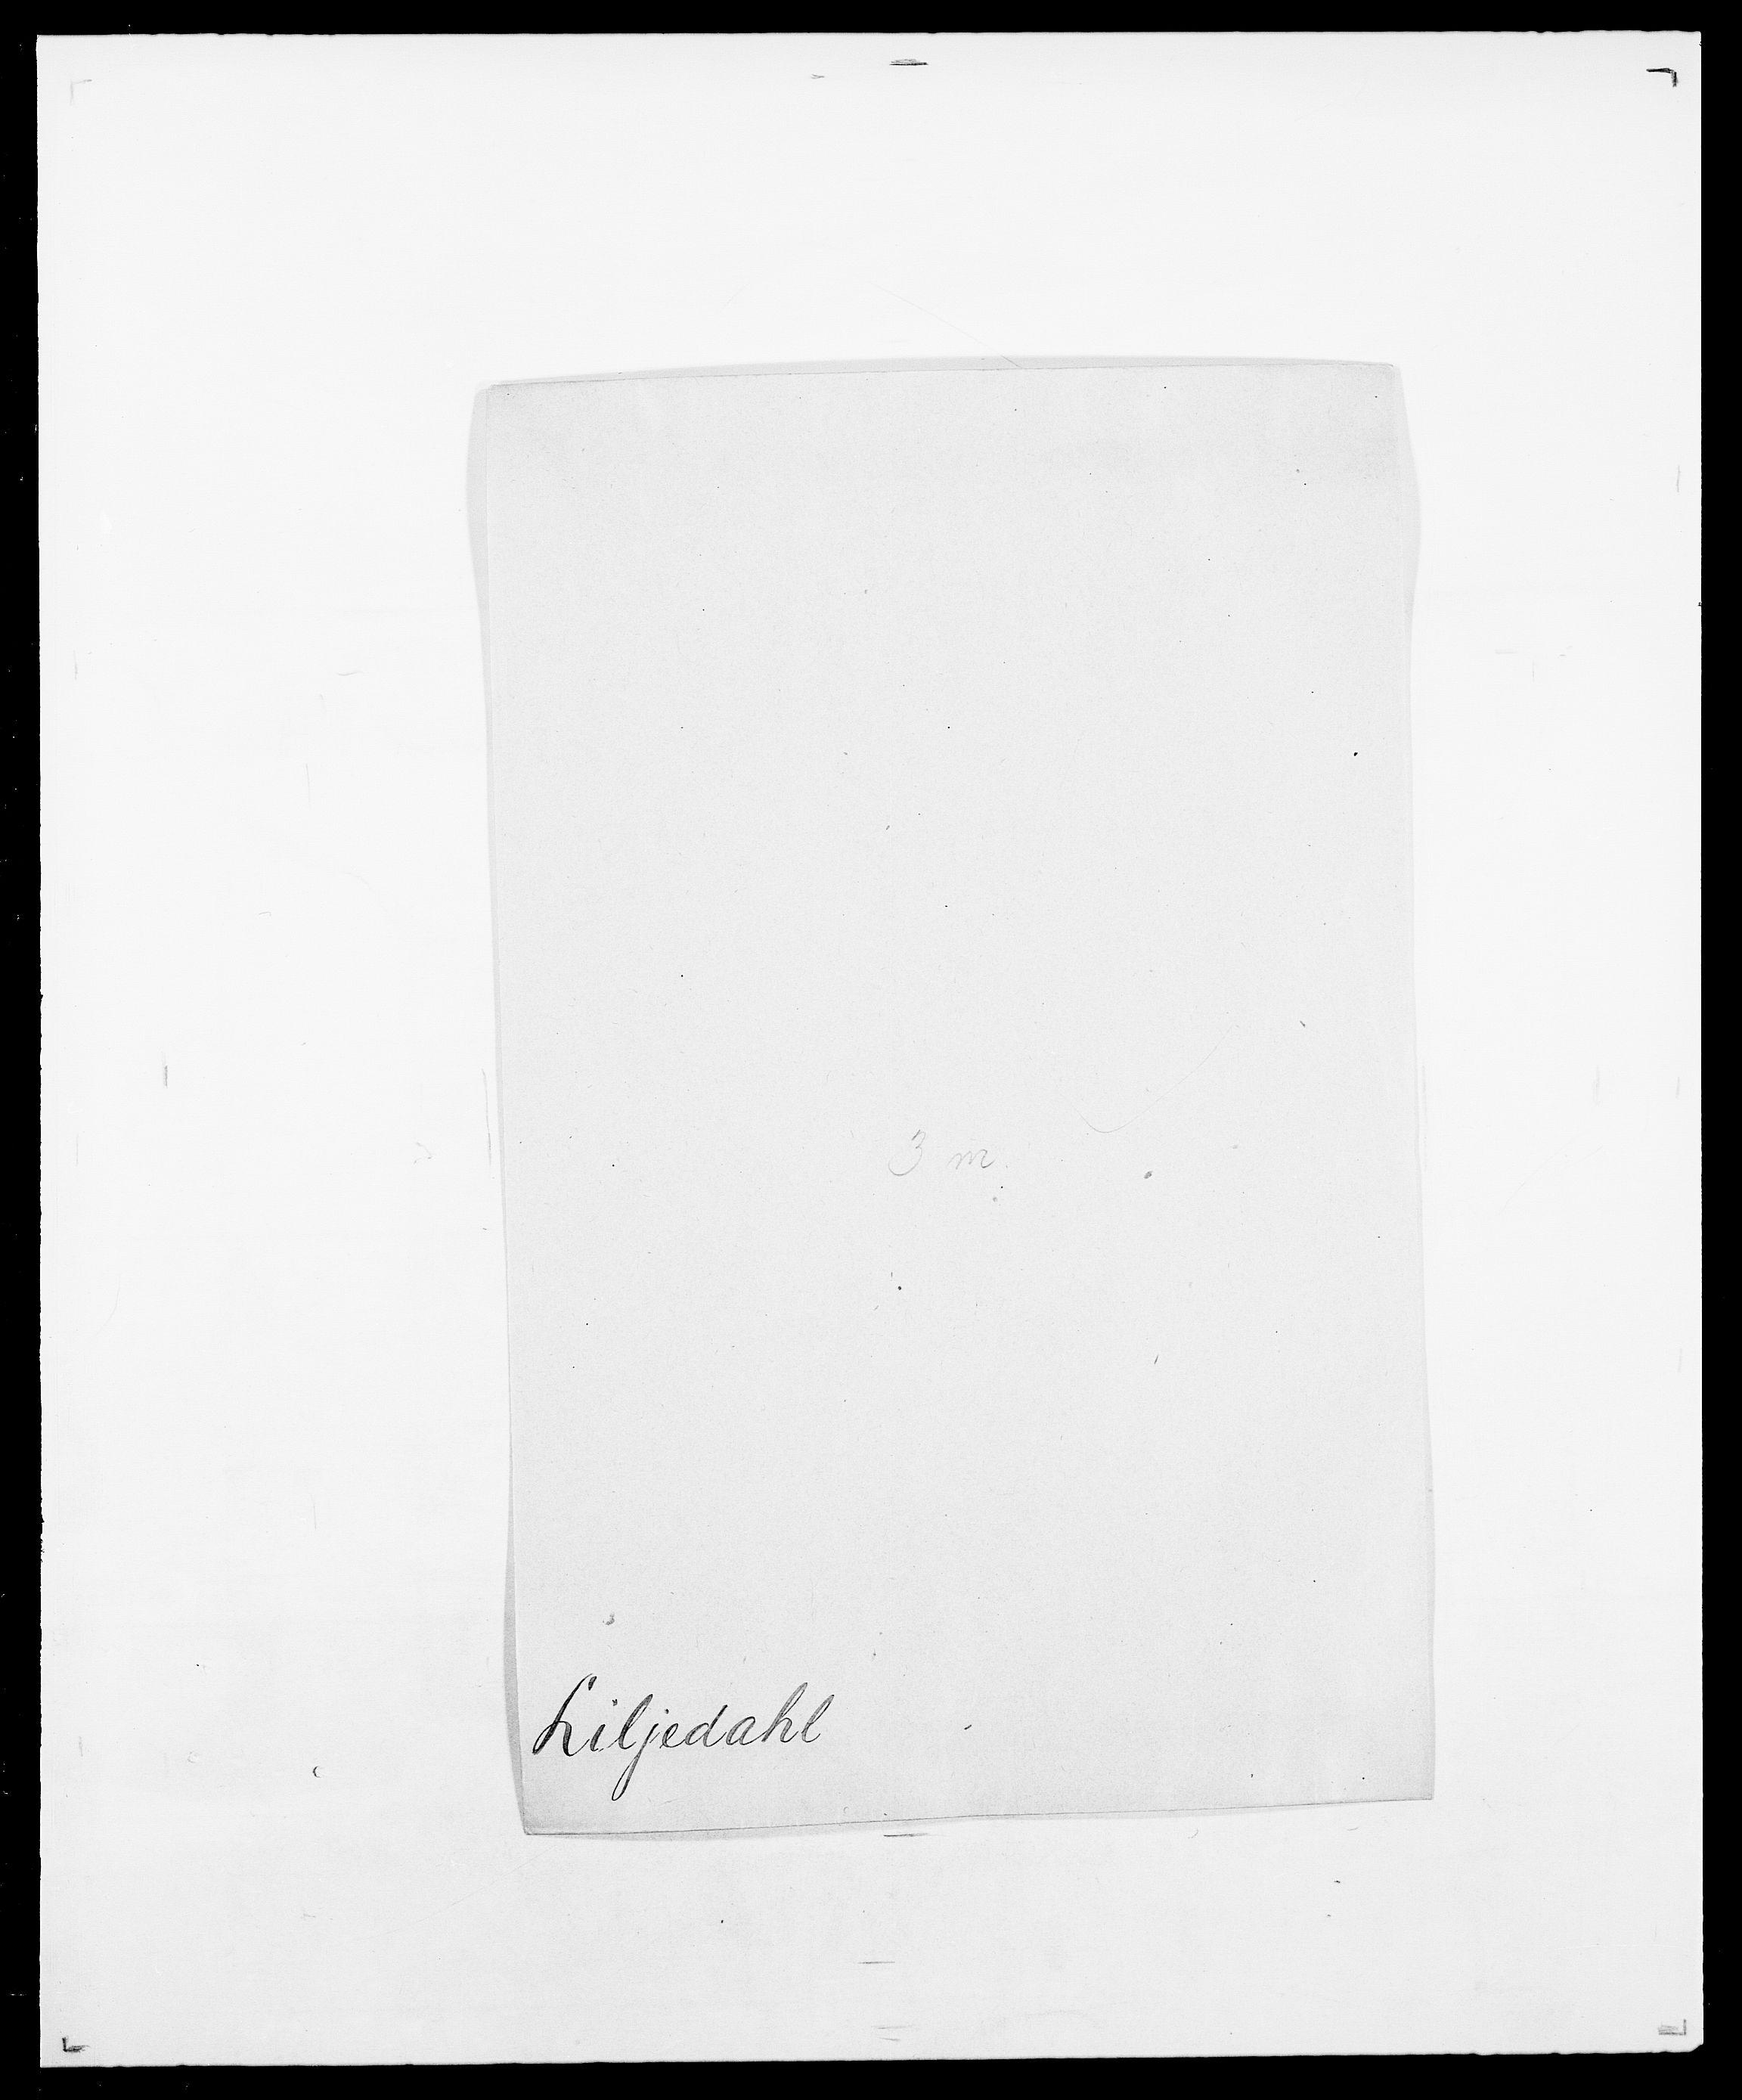 SAO, Delgobe, Charles Antoine - samling, D/Da/L0023: Lau - Lirvyn, s. 403